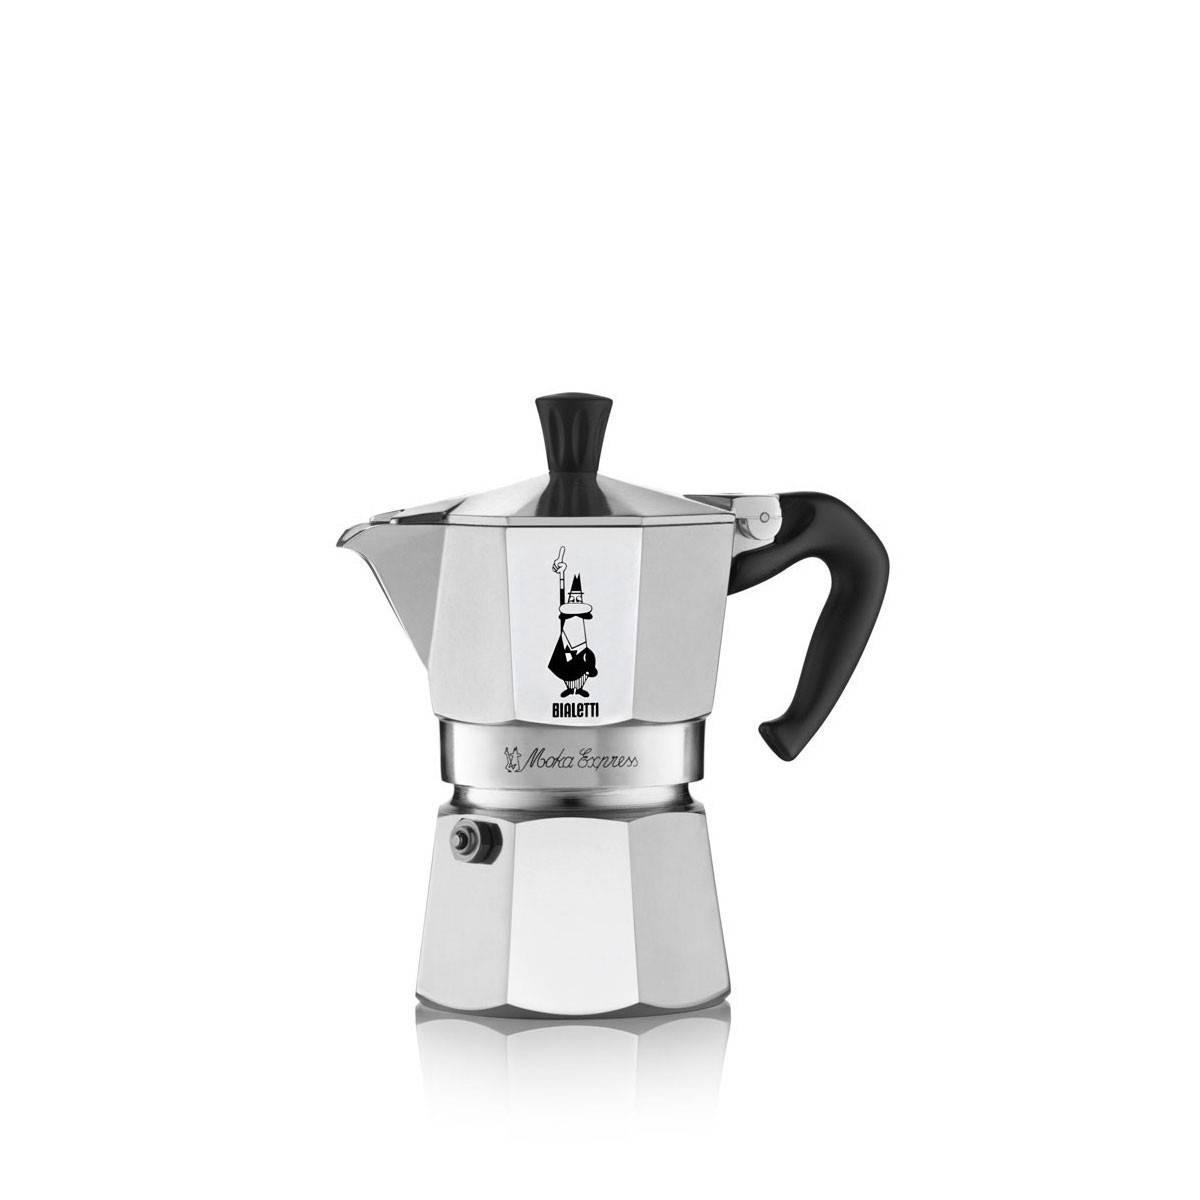 Bialetti kávovar Moka Express na 4 šálky - Bialetti